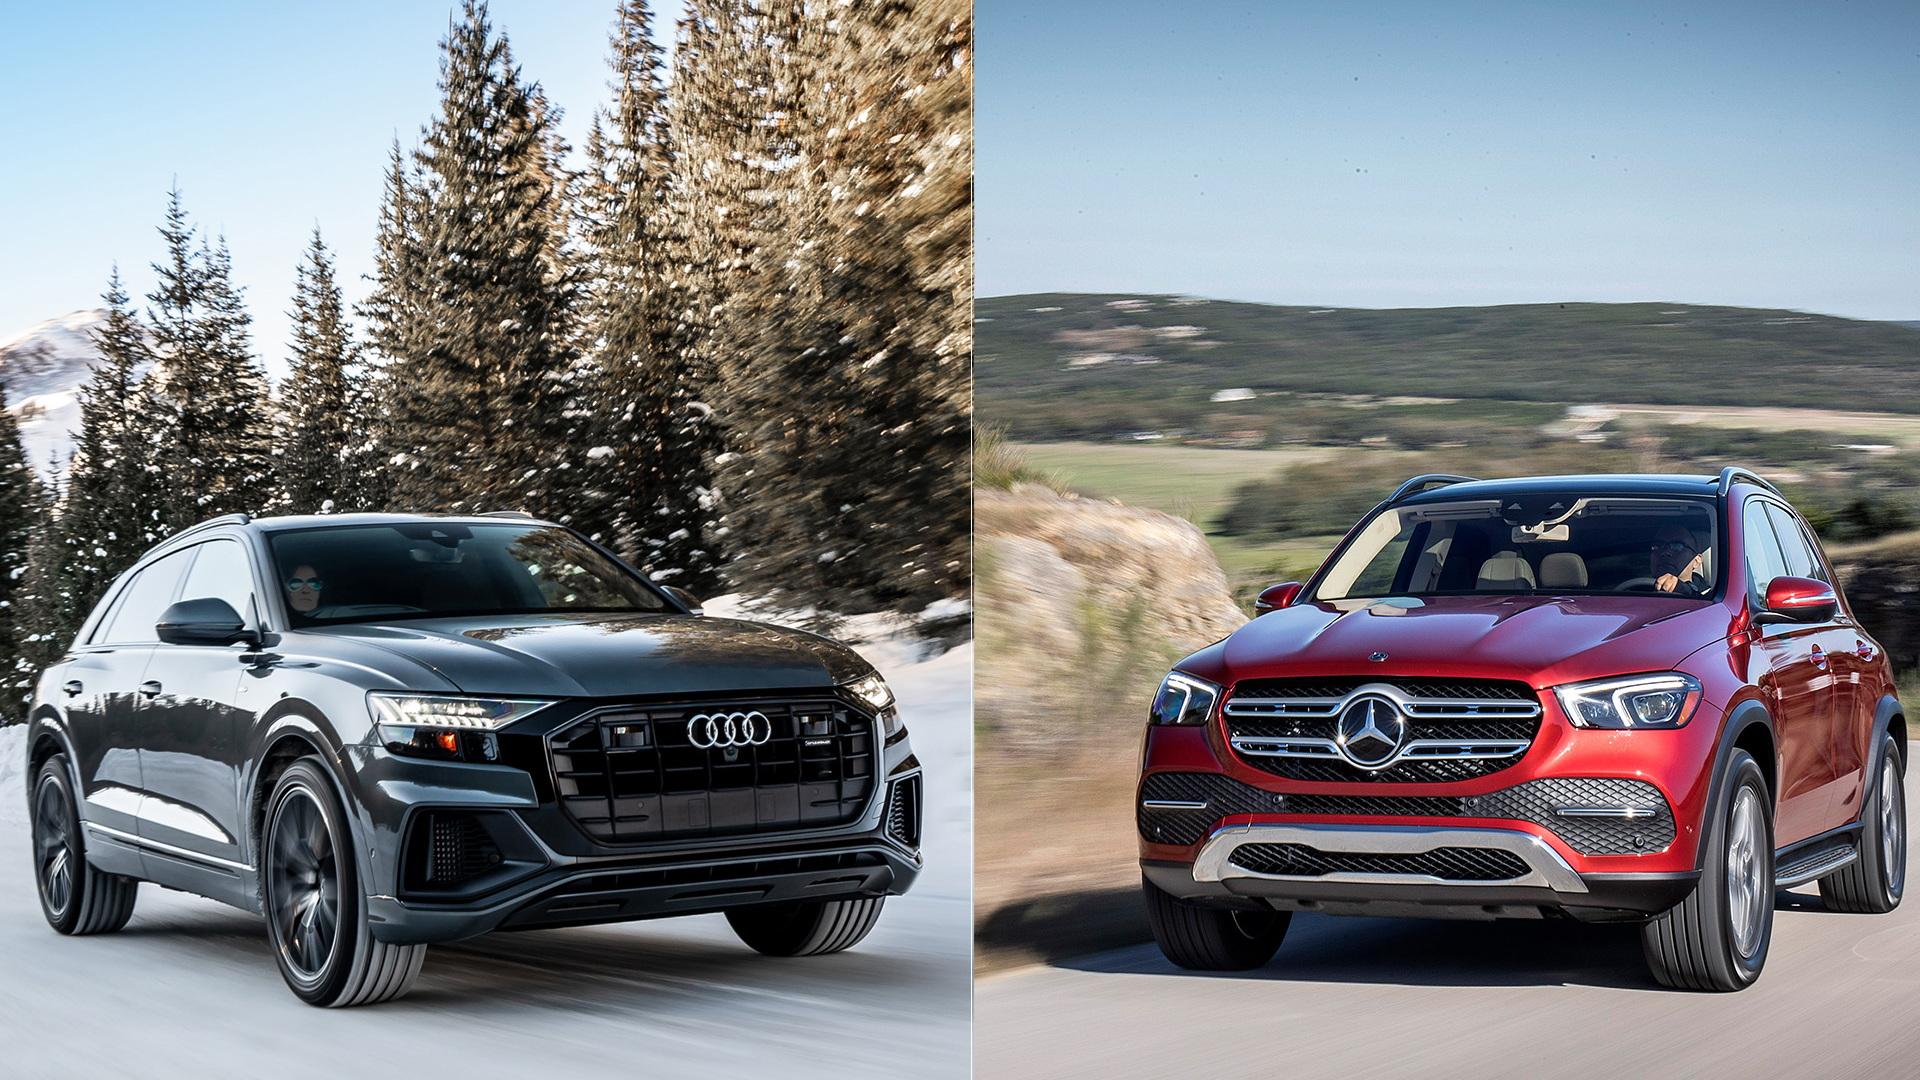 2019 Audi Q8 vs. 2020 Mercedes-Benz GLE-Class